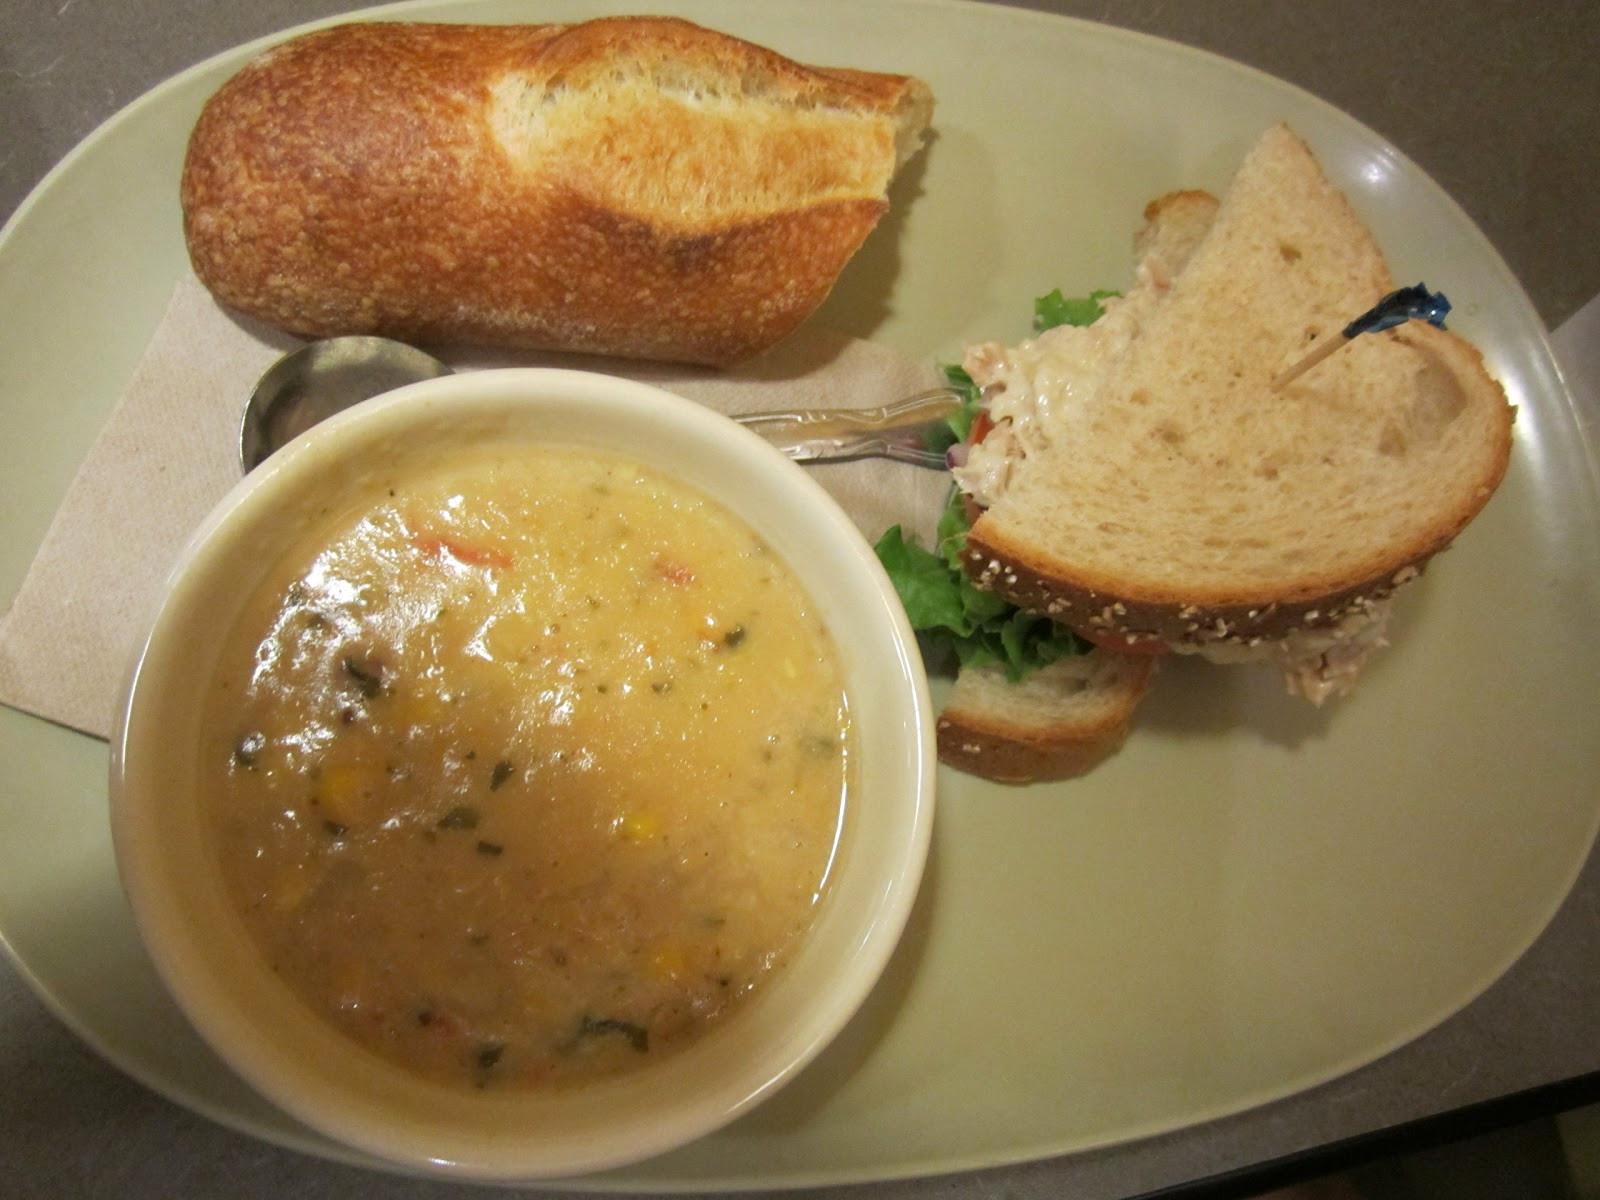 Summer Corn Chowder Panera  Panera Bread Restaurant Copycat Recipes Summer Corn Chowder